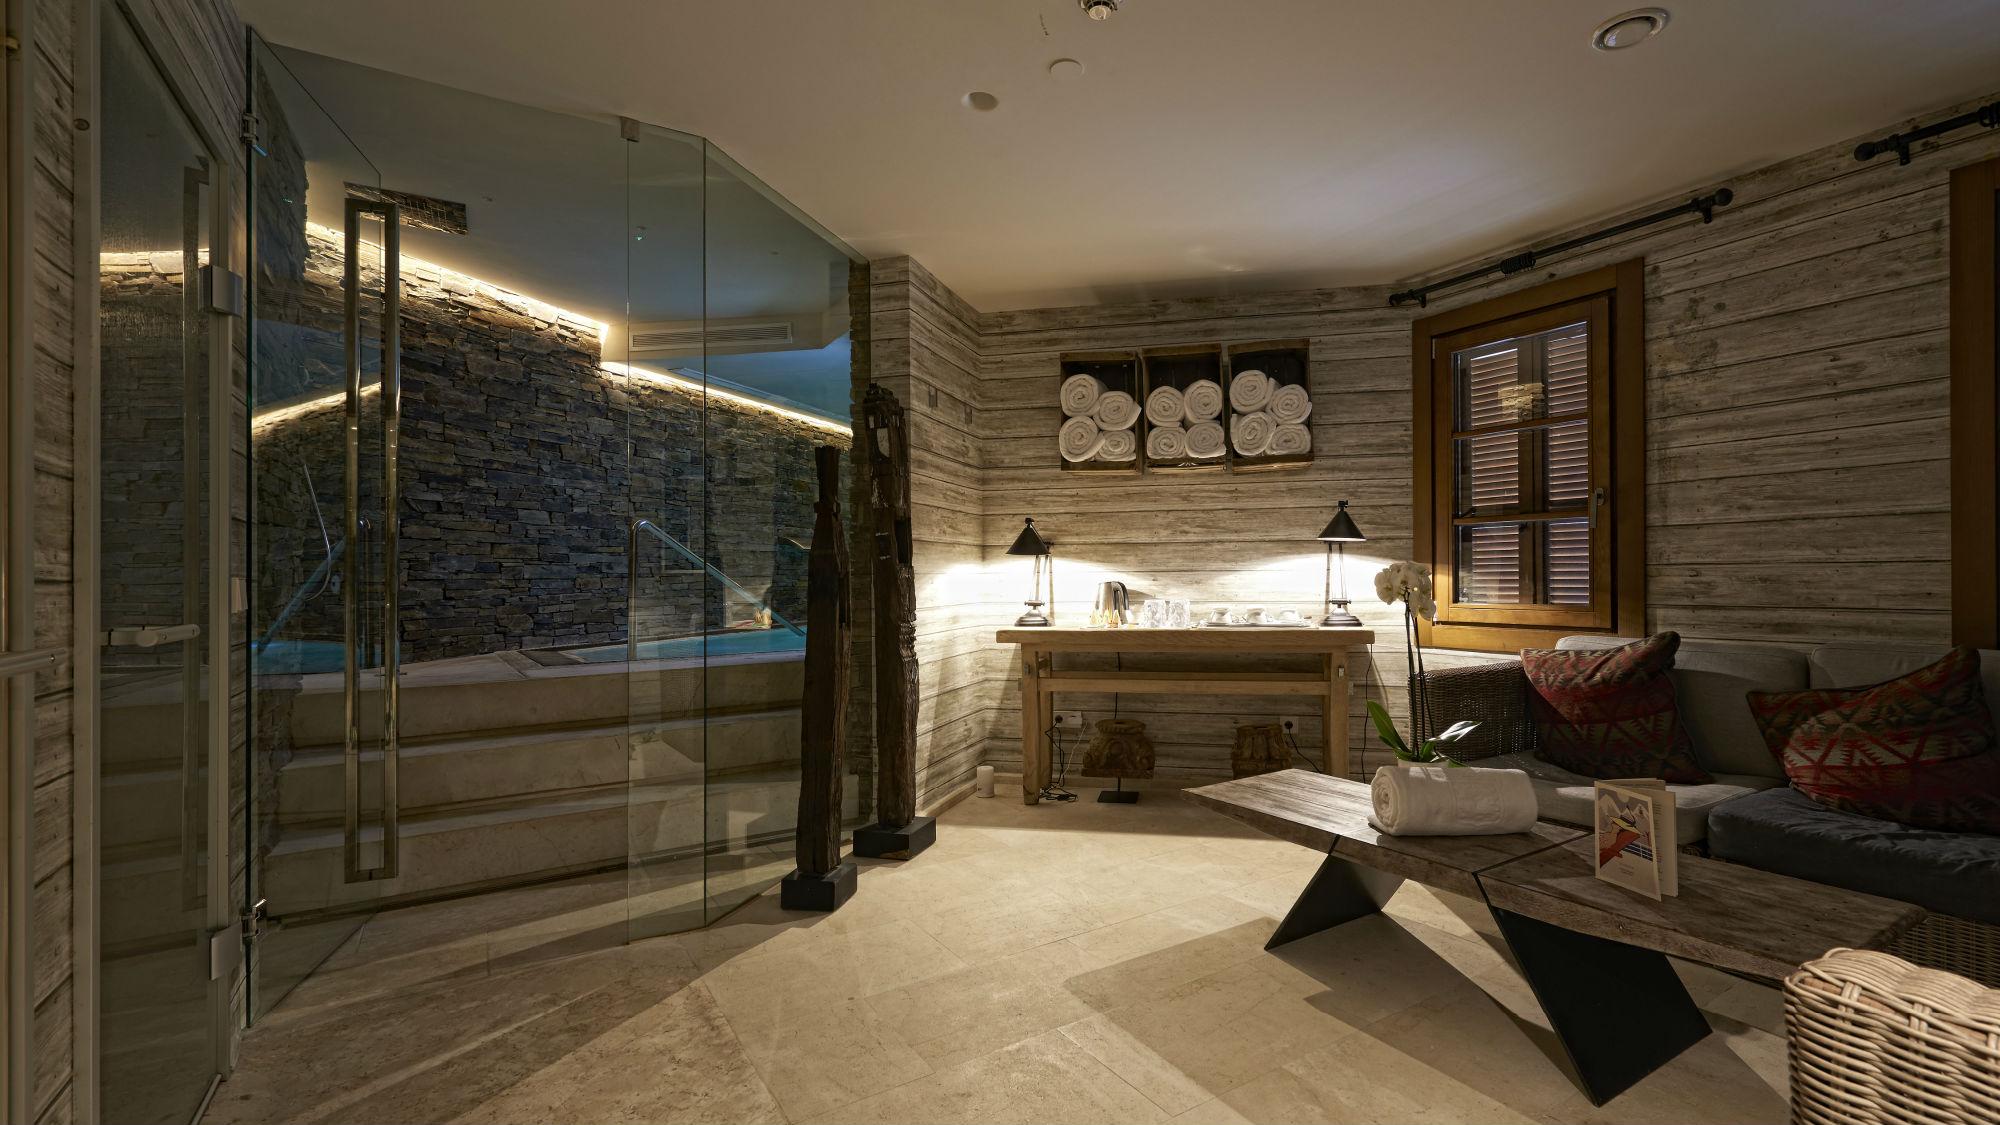 Indoor-Pool-Reception_El_Lodge_Hotel_Spain.jpg